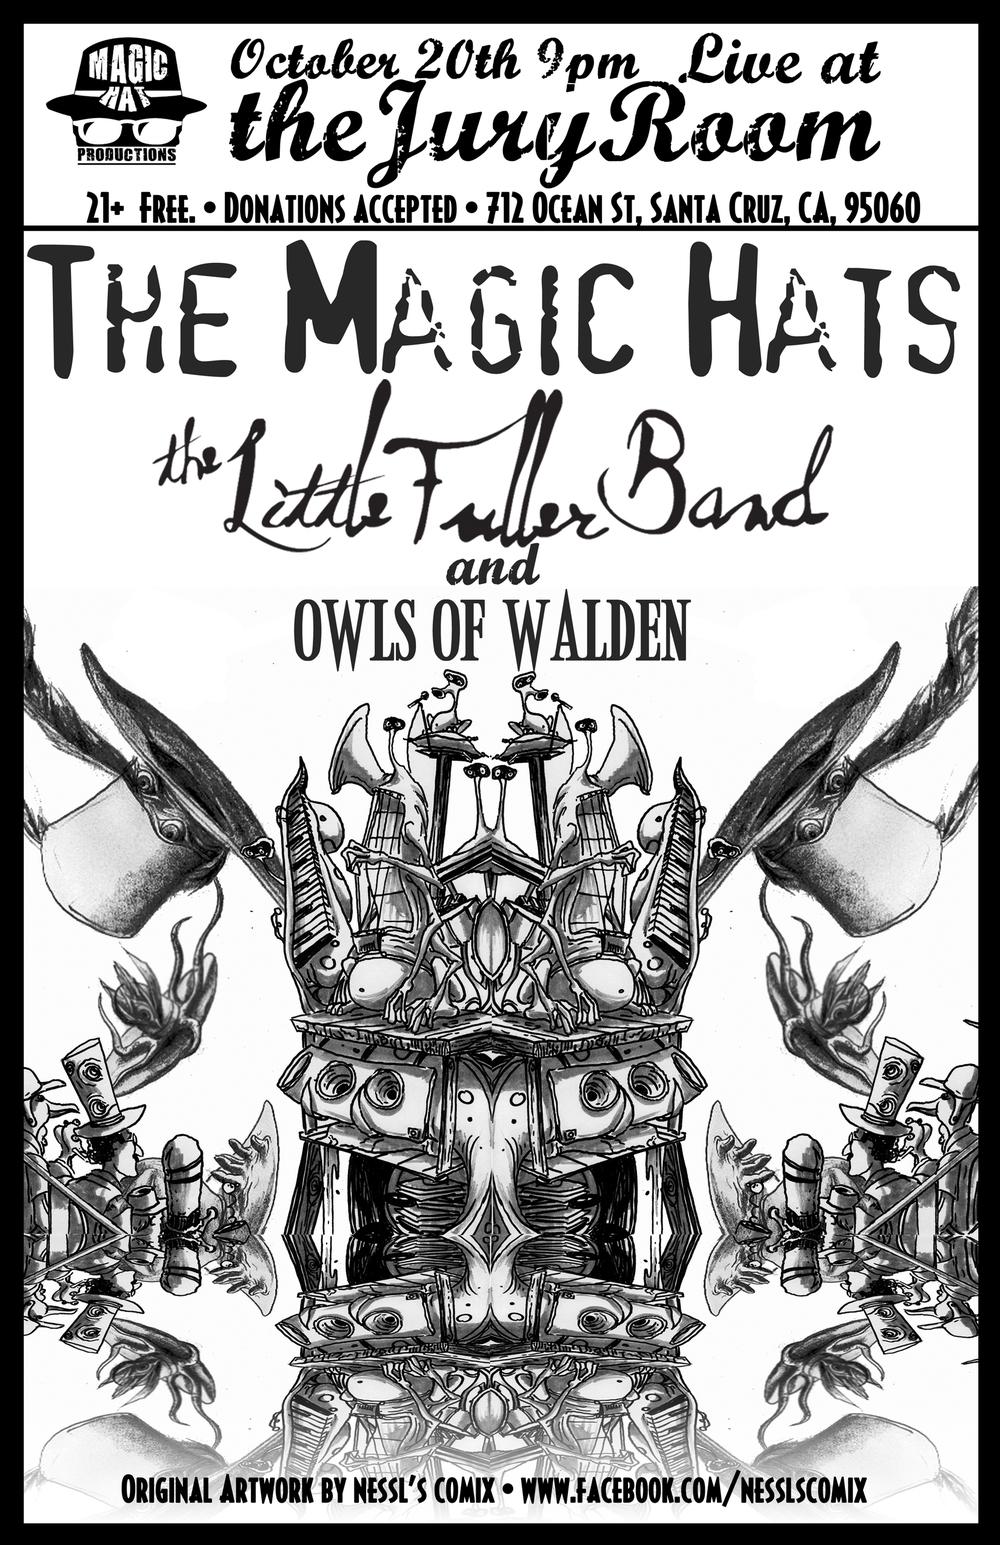 MAgic-Hats-Jury10.20.12.jpg